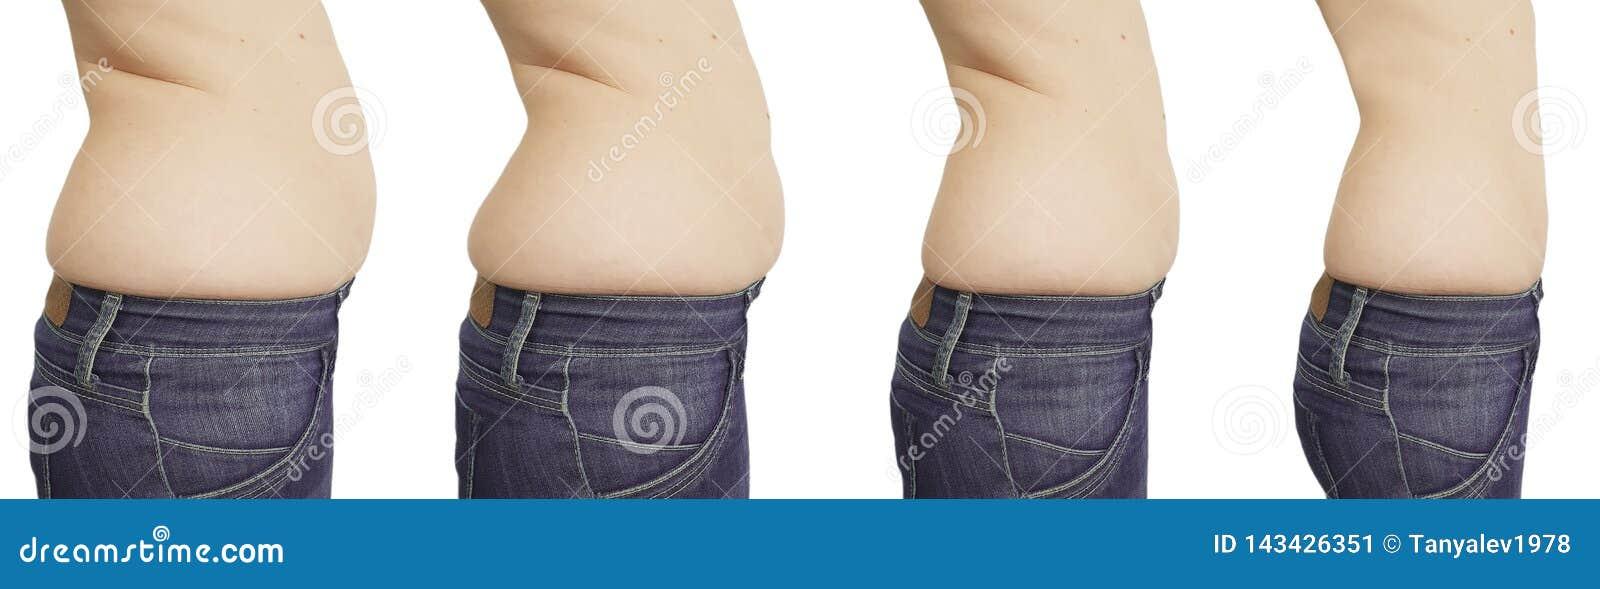 perte de poids du ventre avis de perte de poids dr lee